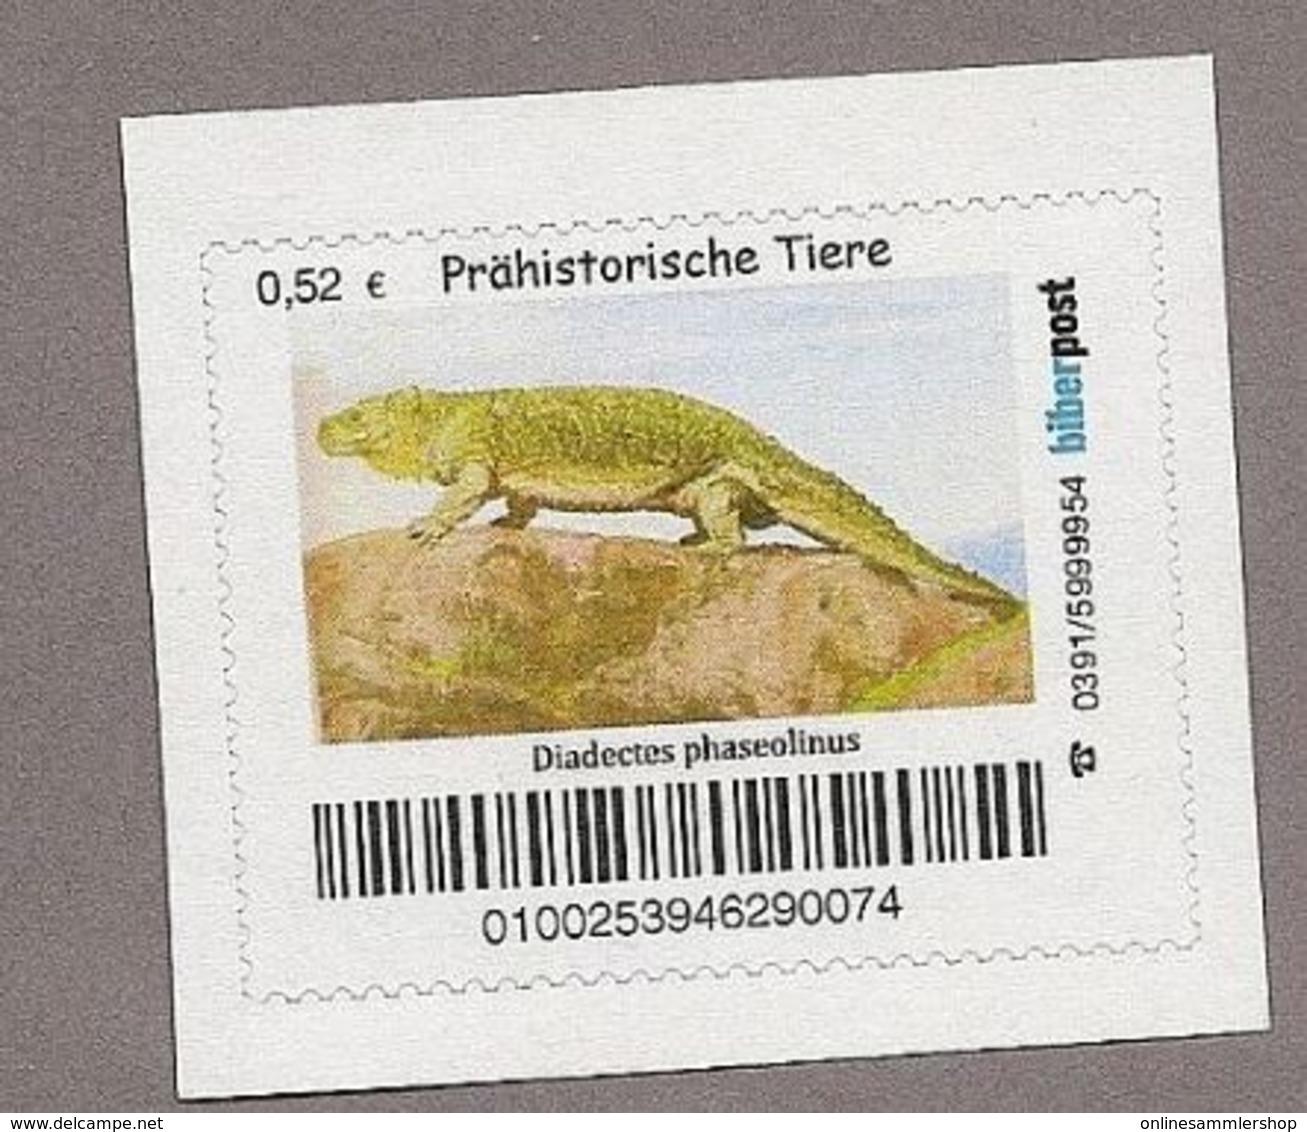 BRD - Privatpost - Biberpost - Prähistorische Tiere - Diadectes Phaseolinus - Postzegels